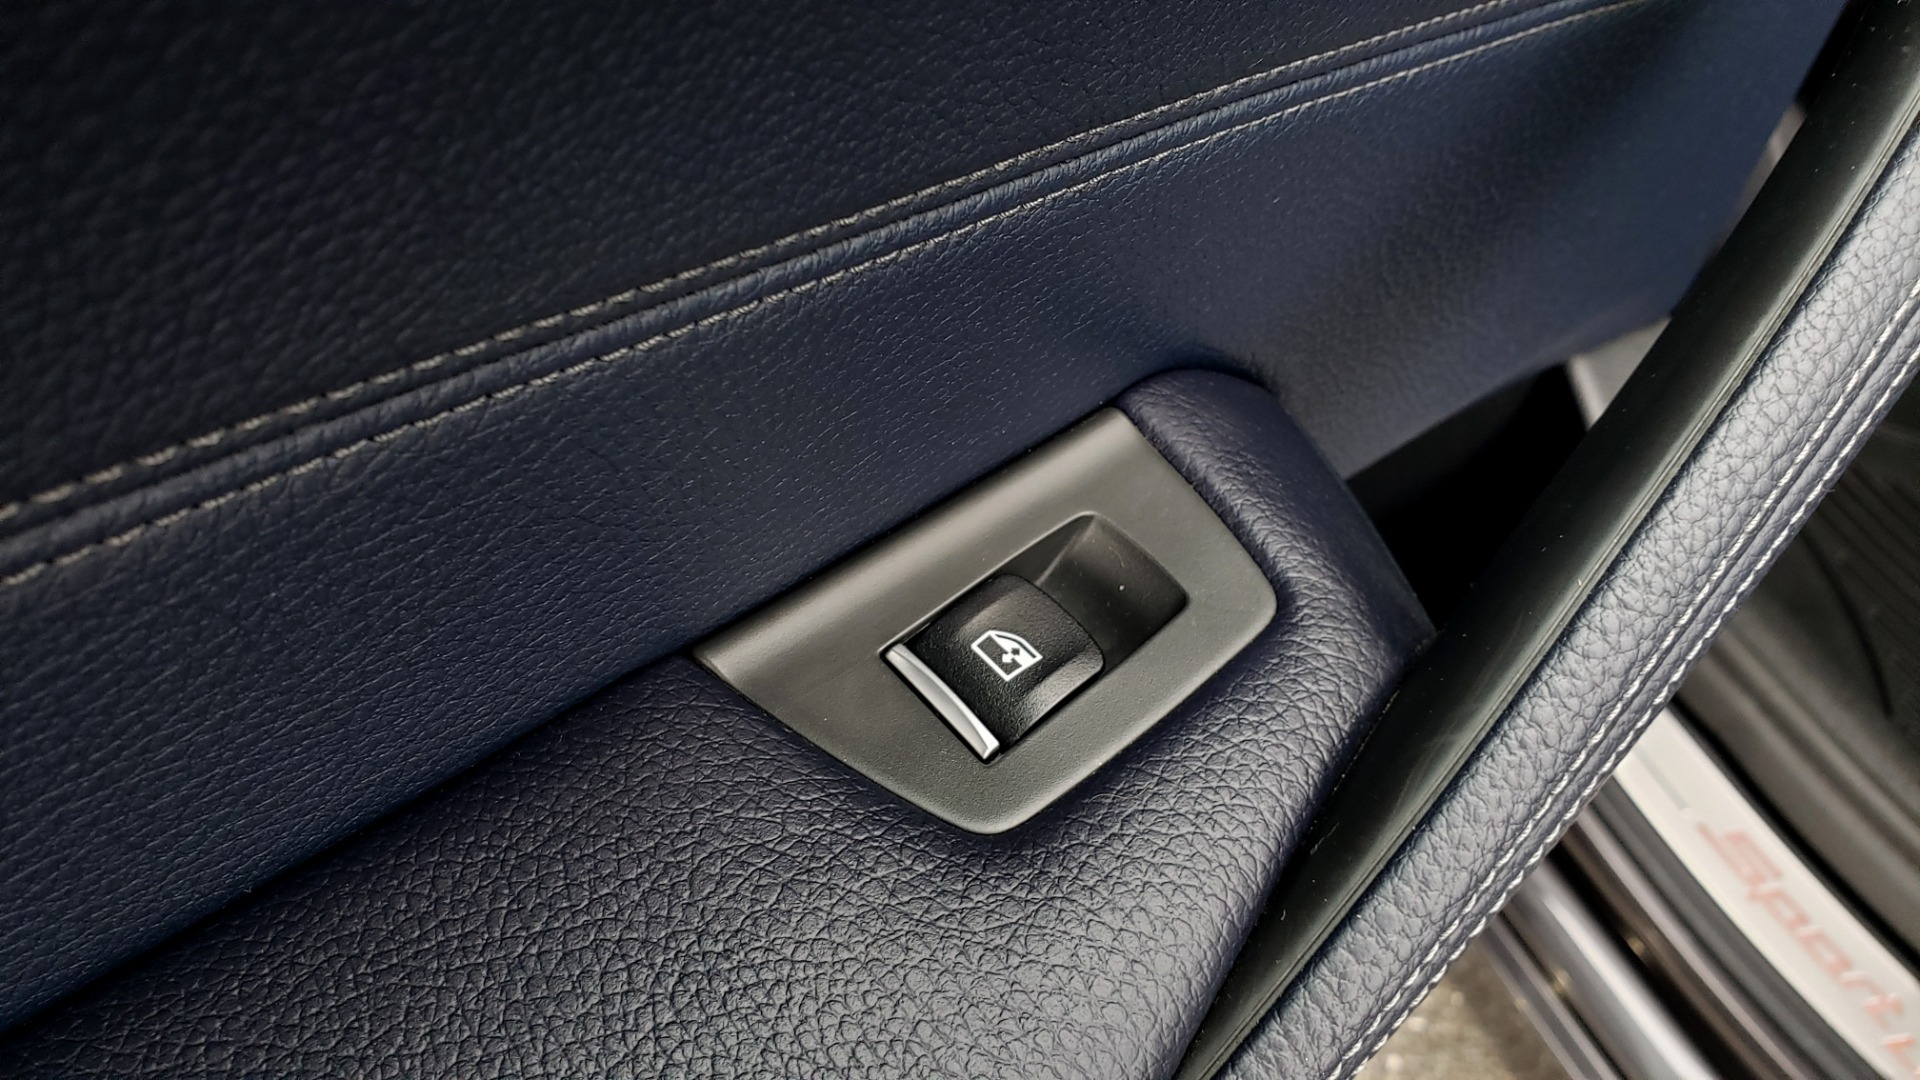 Used 2017 BMW 5 SERIES 530IXDRIVE / PREM PKG / DRVR ASST PLUS / CLD WTHR / APPLE CARPLAY for sale Sold at Formula Imports in Charlotte NC 28227 60